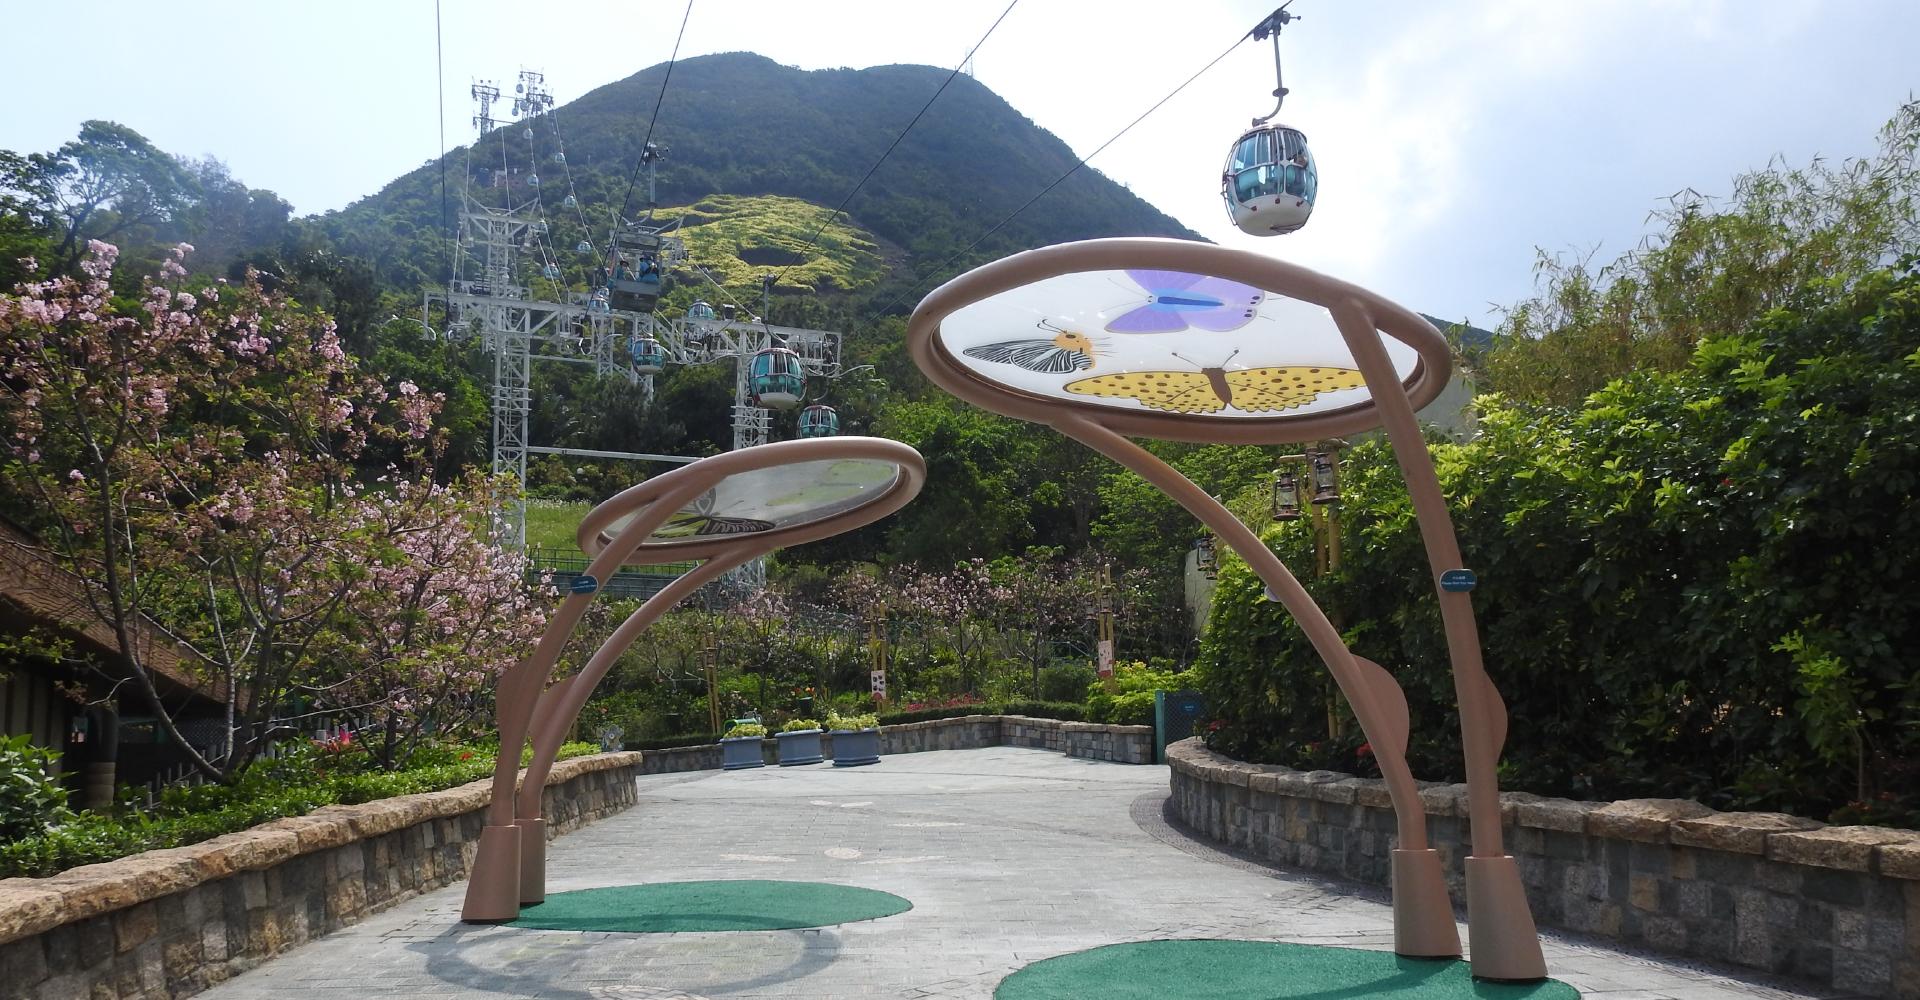 https://media.oceanpark.com.hk/files/s3fs-public/eco-trail-desktop.jpg